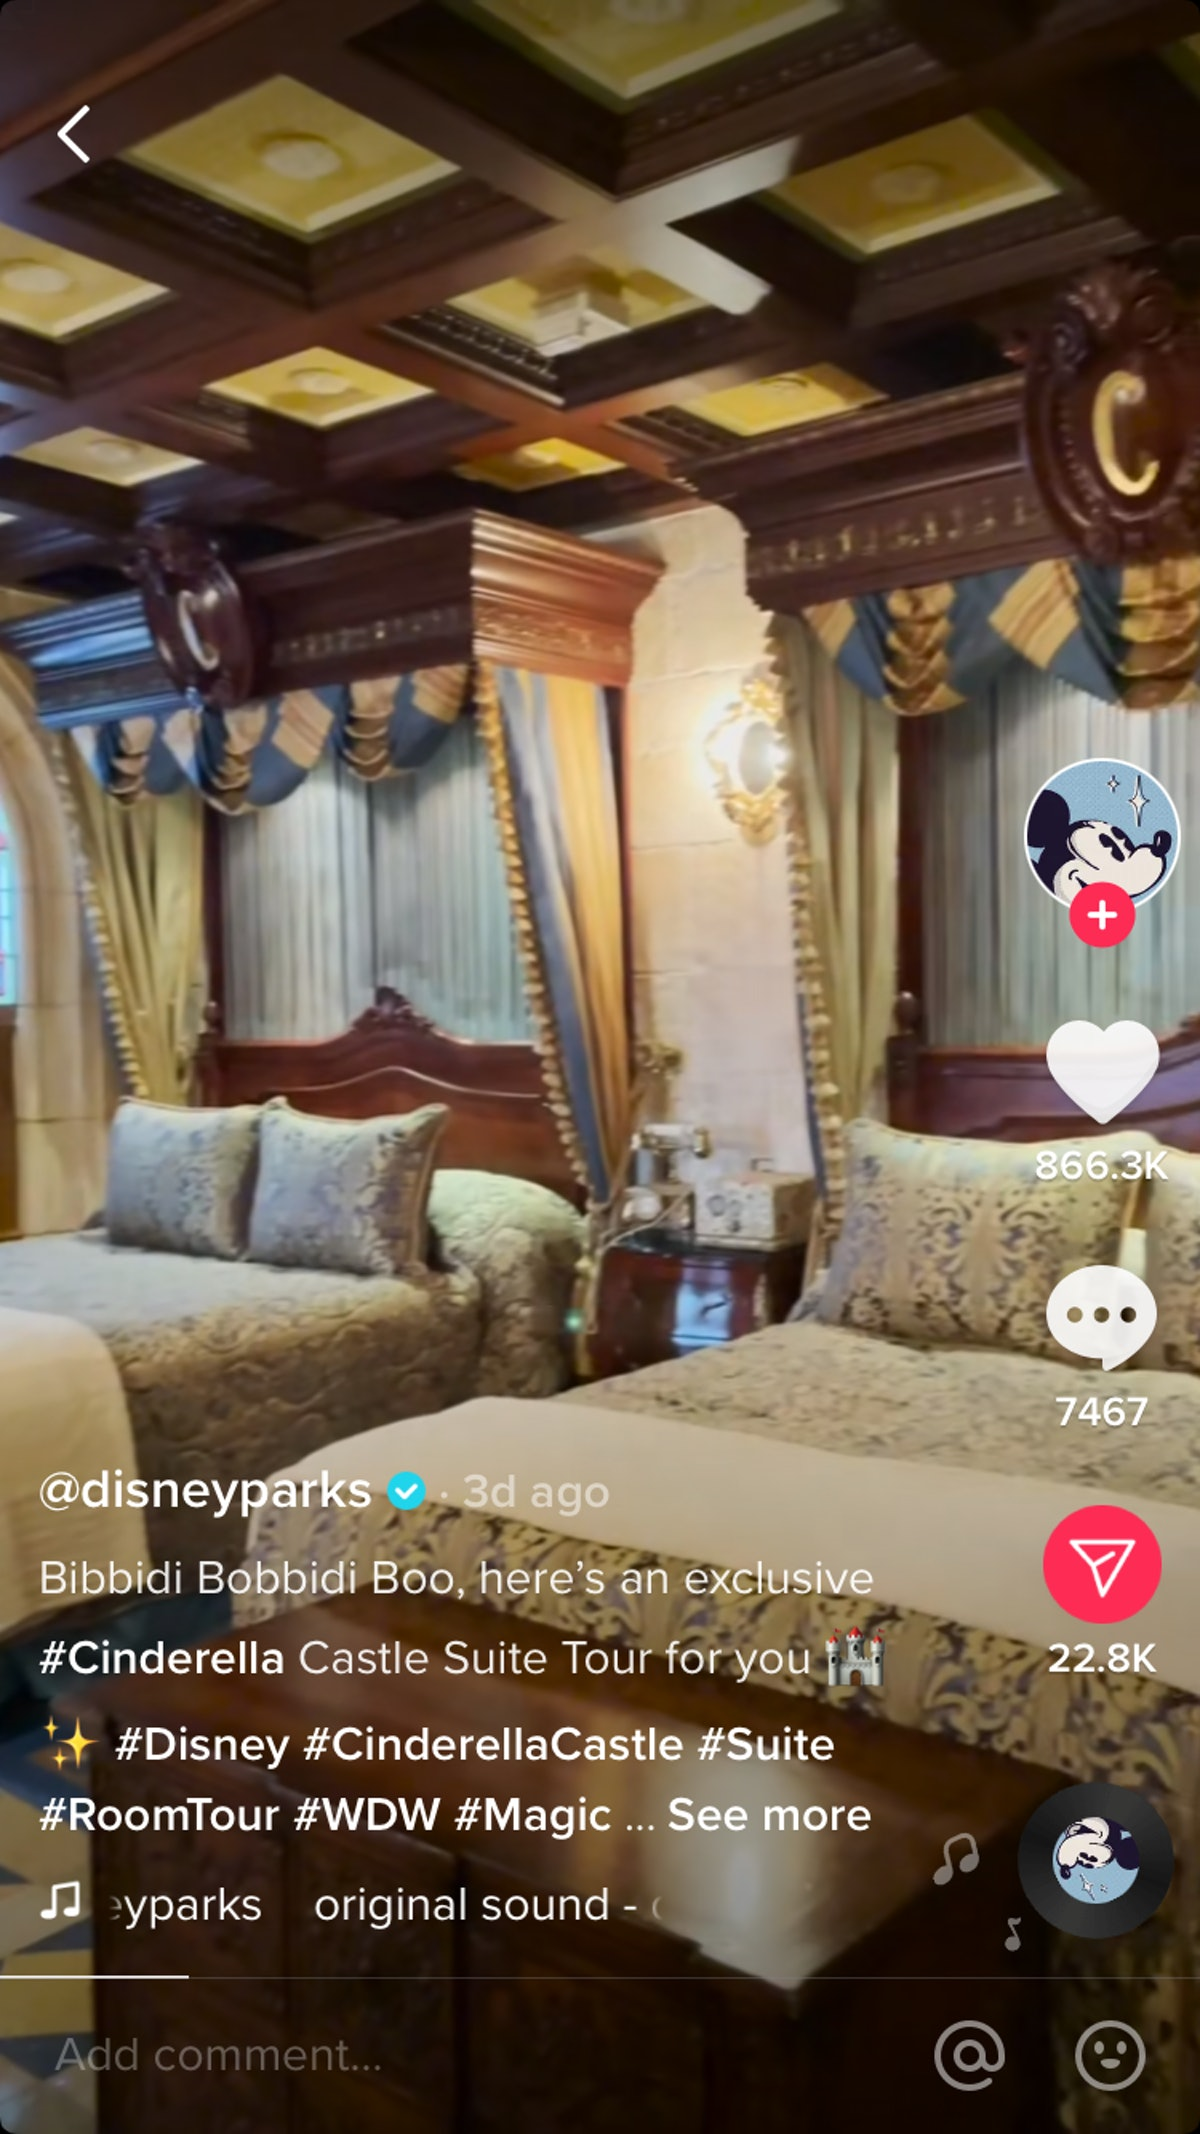 Disney's video tour of the Cinderella Castle Suite on TikTok has gone viral.